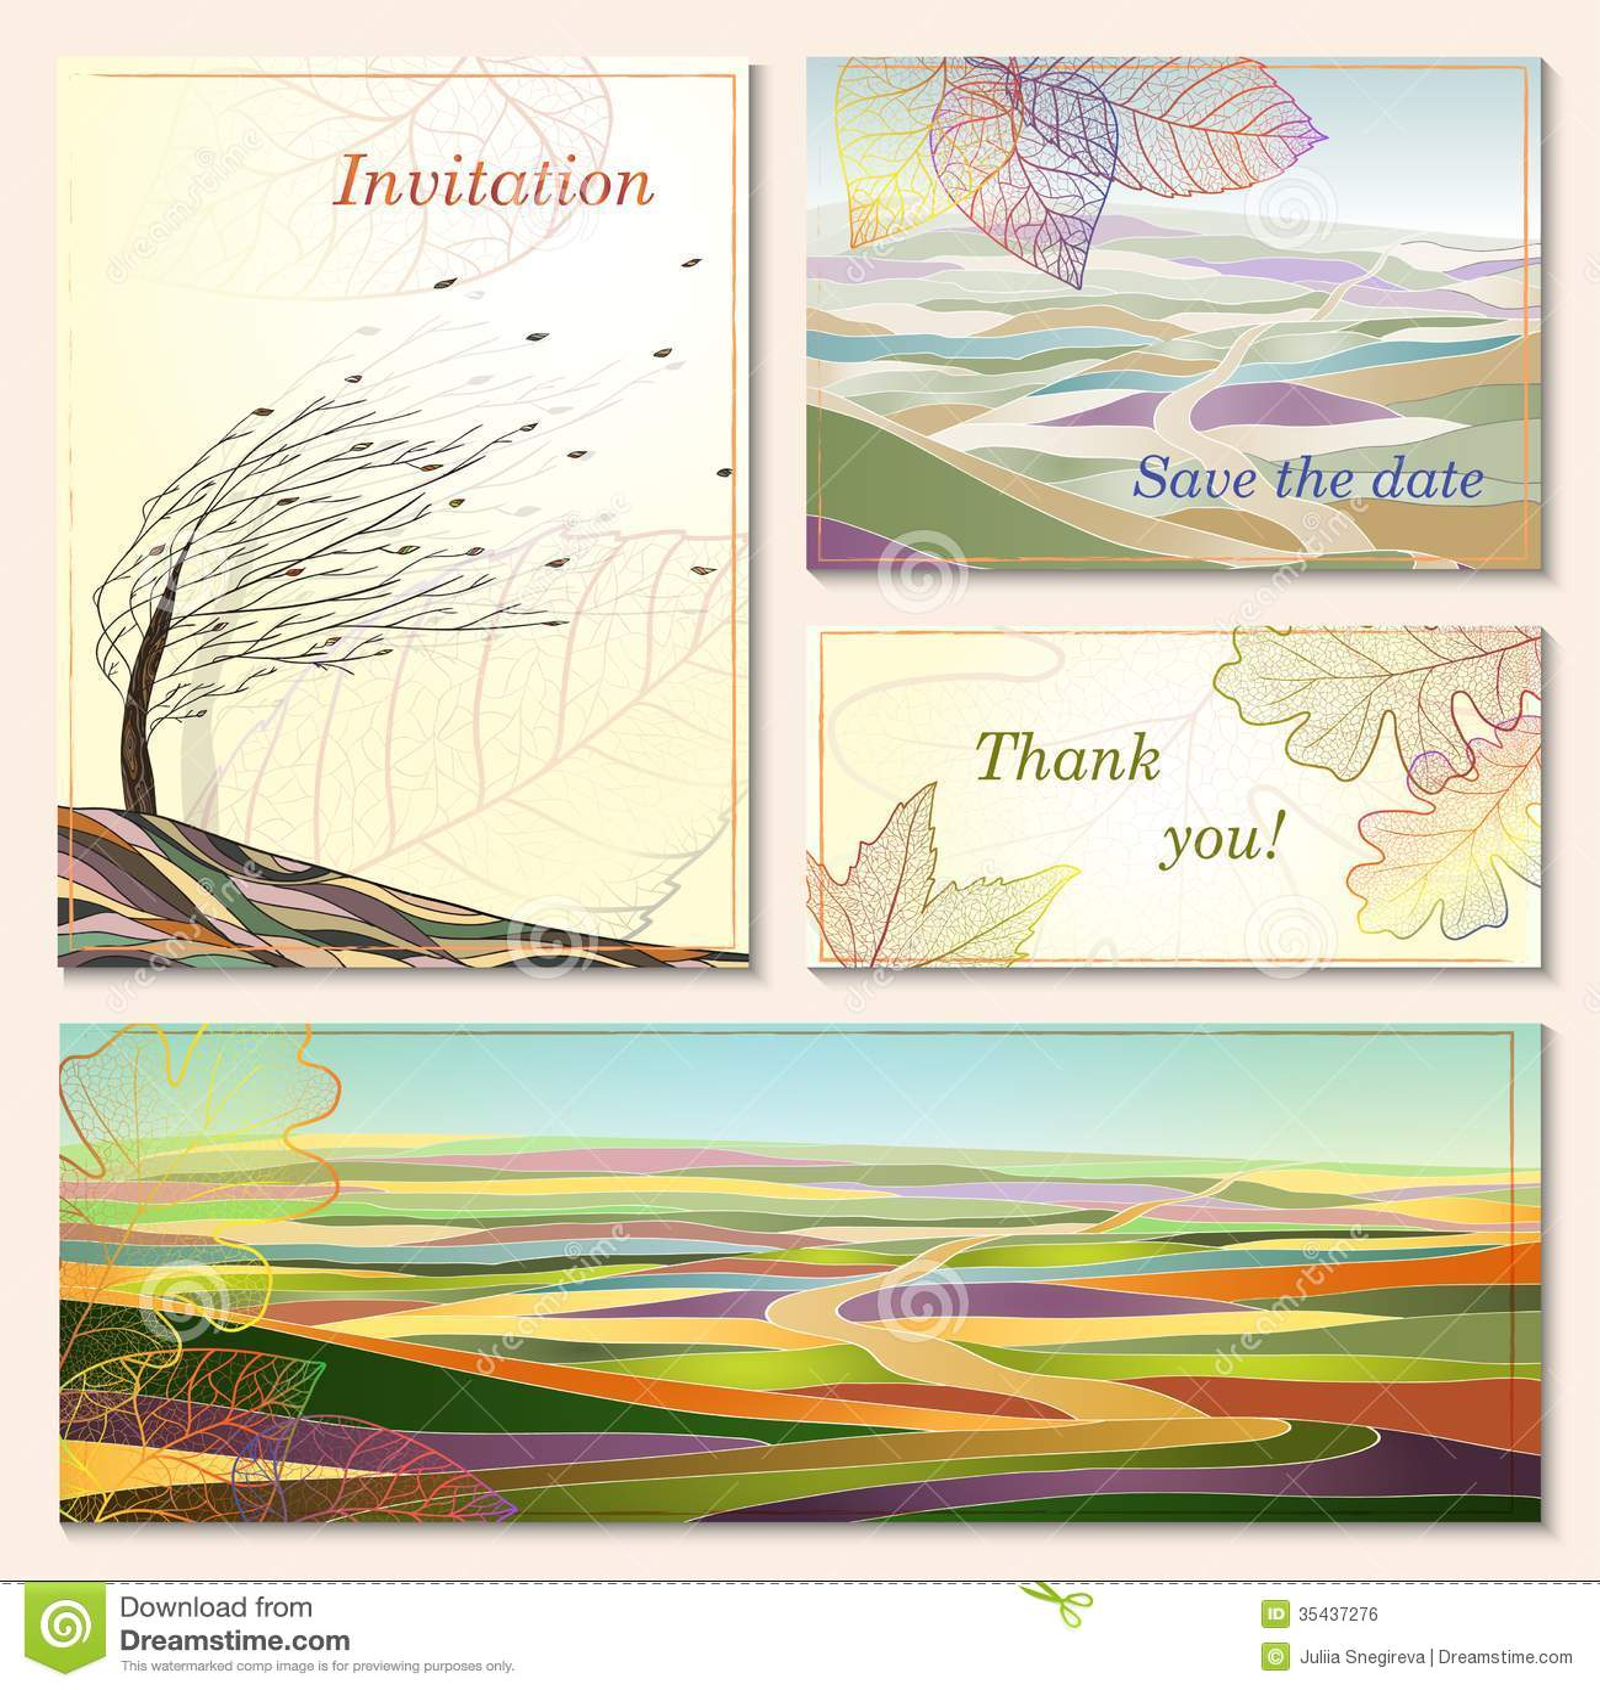 invitation card with autumn landscapes stock photo image 35437276. Black Bedroom Furniture Sets. Home Design Ideas